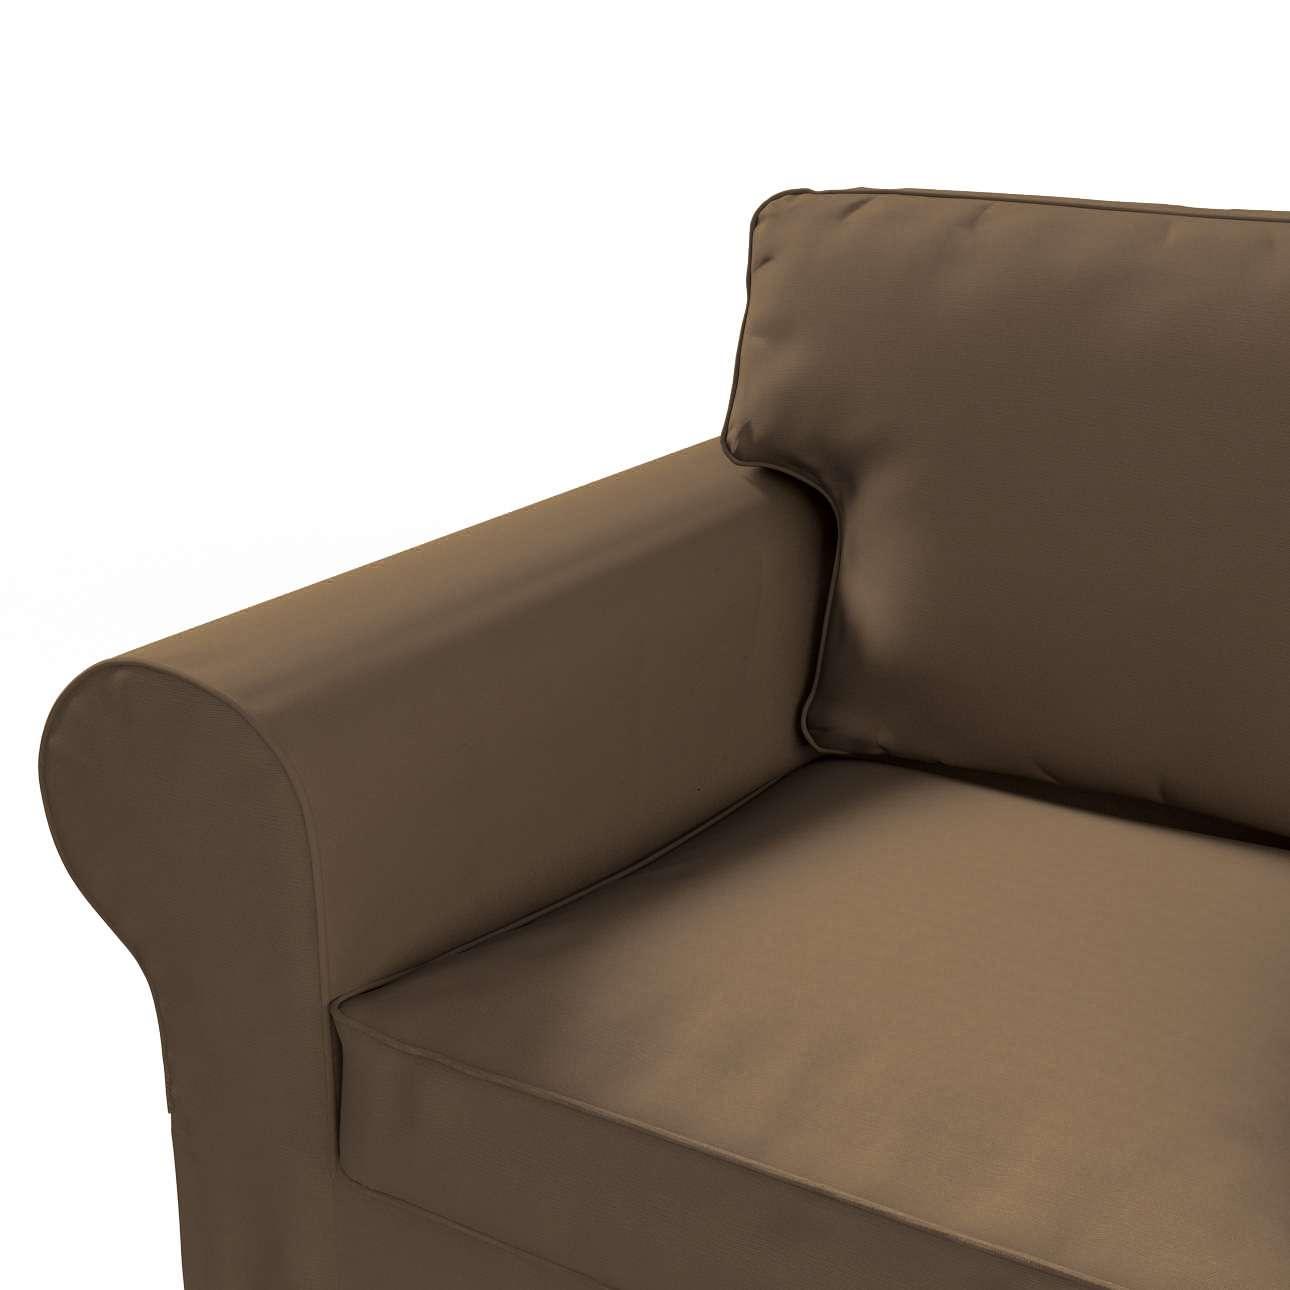 Ektorp 2-Sitzer Sofabezug nicht ausklappbar Sofabezug für  Ektorp 2-Sitzer nicht ausklappbar von der Kollektion Cotton Panama, Stoff: 702-02